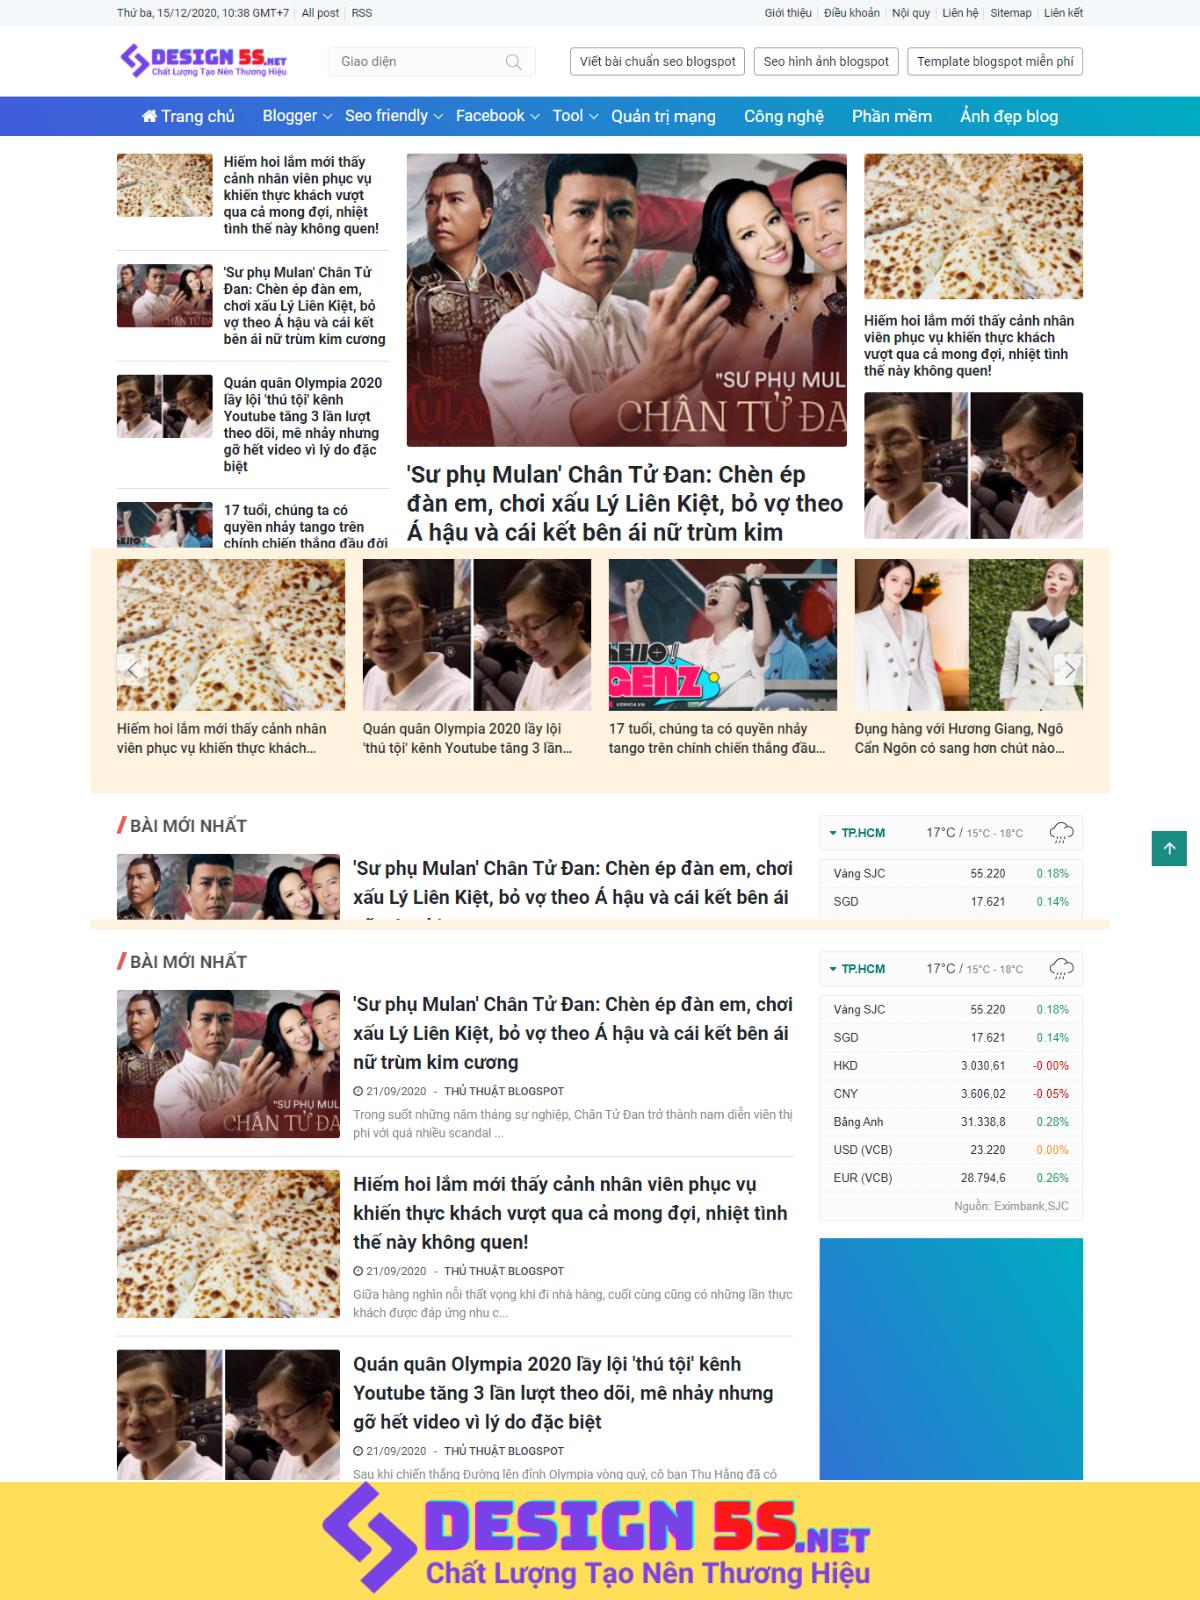 Theme blogspot tin tức atn, đẹp, chuẩn SEO